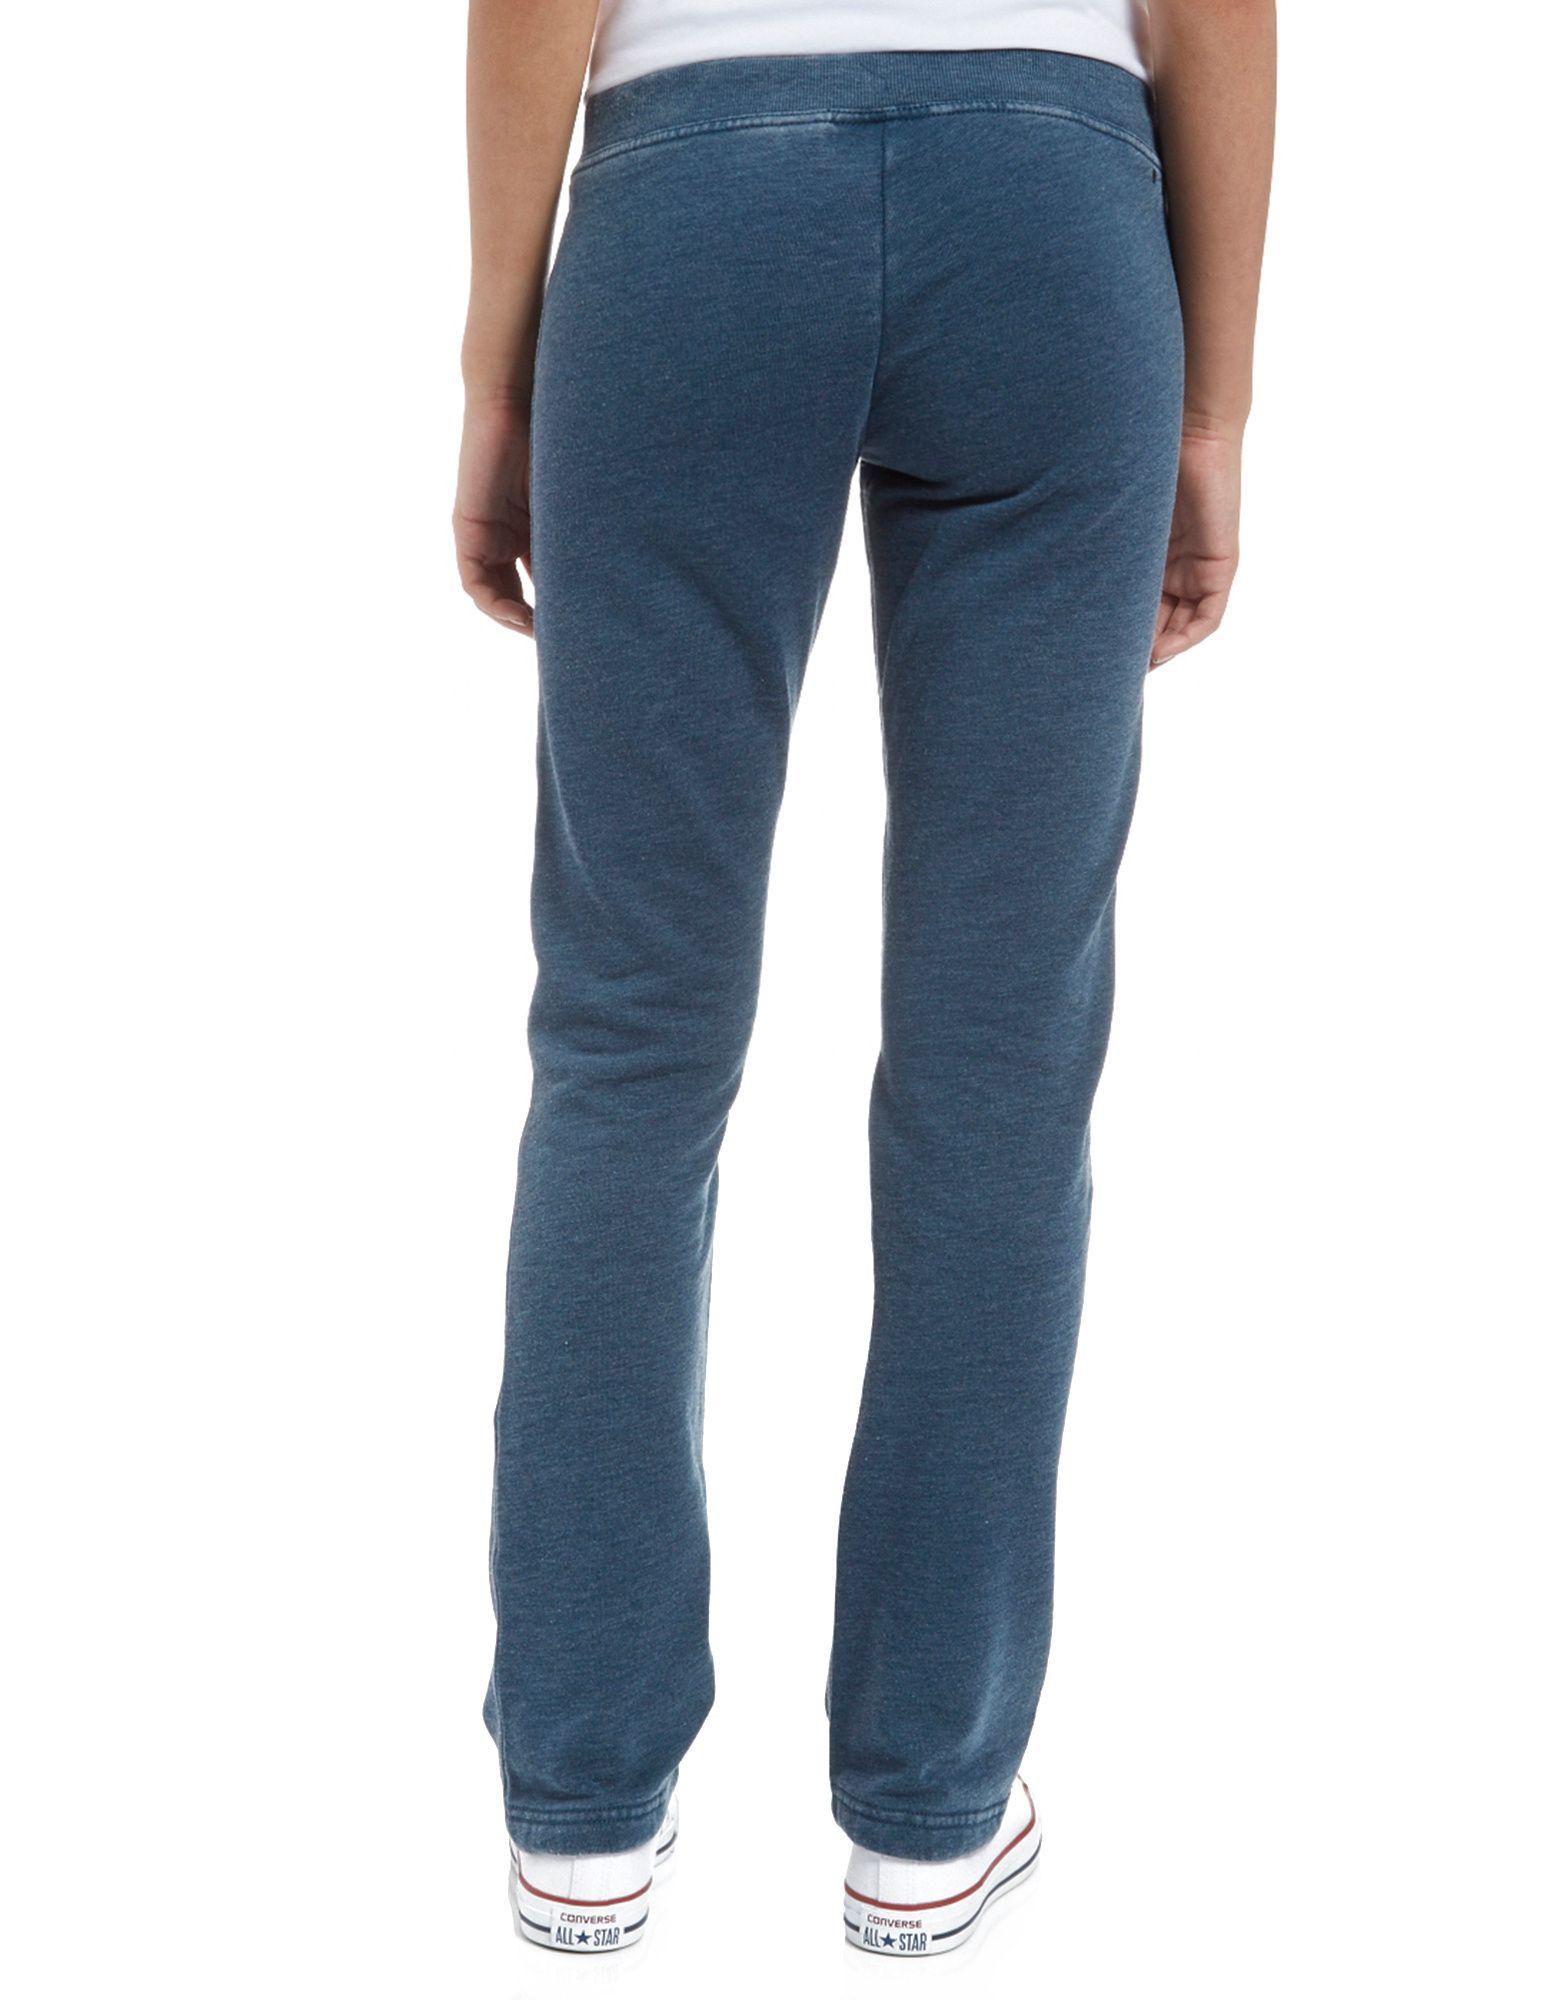 Converse Drawstring Cuff Track Pants